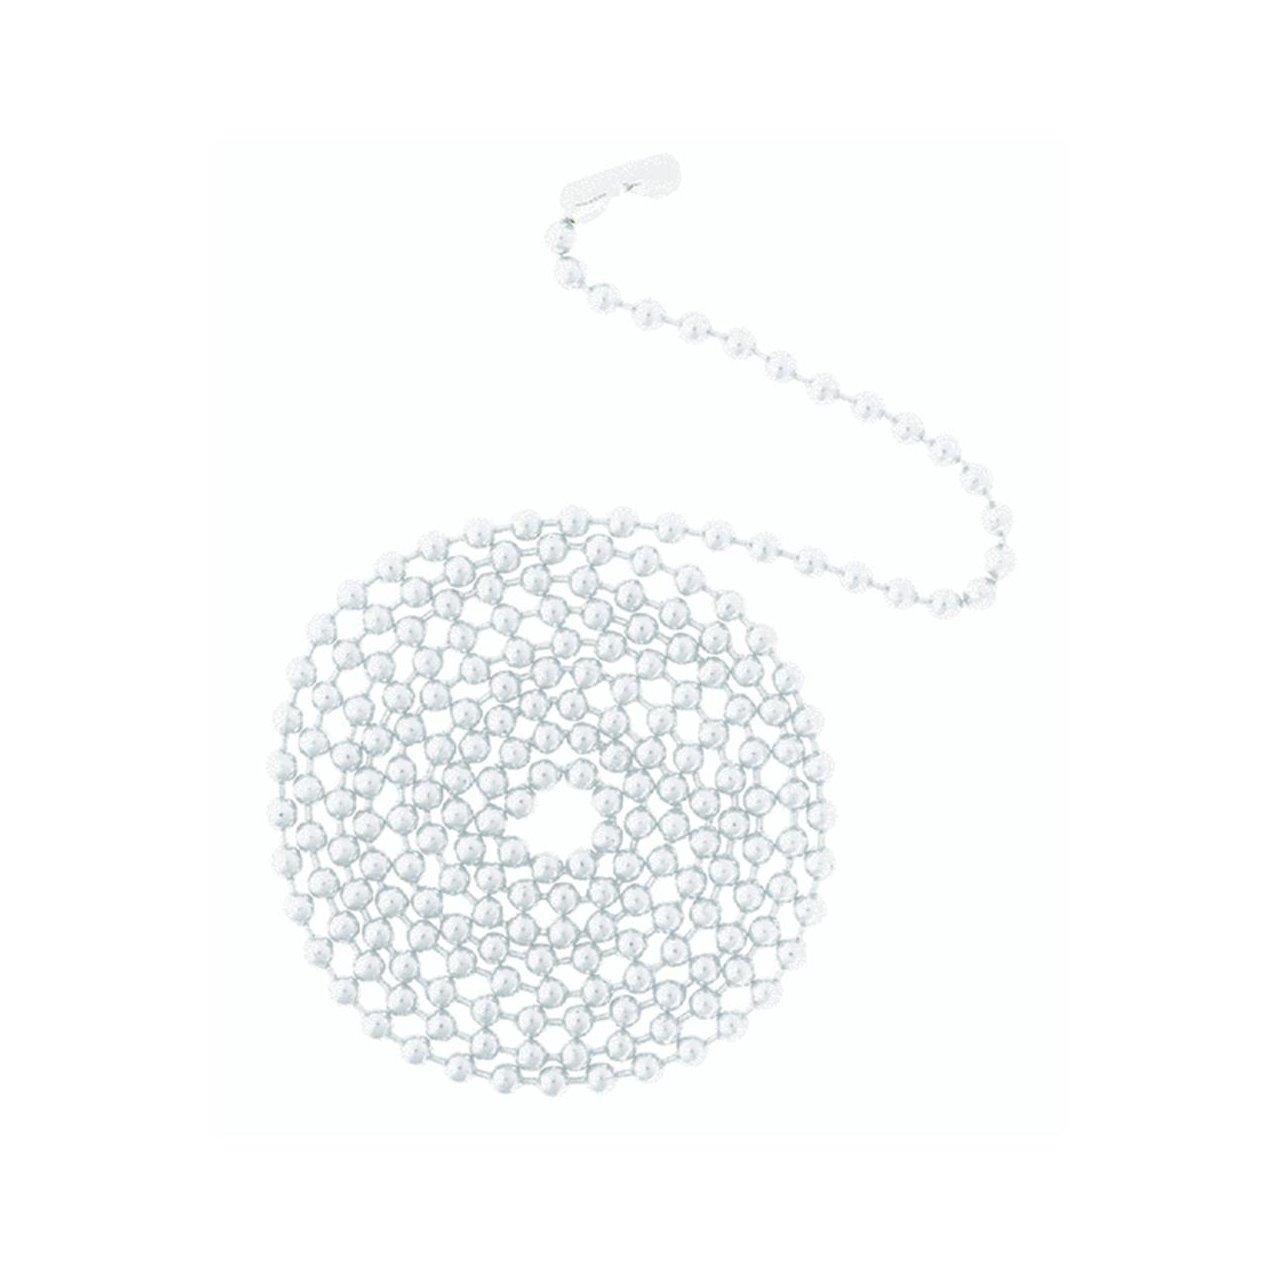 WESTINGHOUSE LIGHTING 77051 Bead Chain, 3-Feet, White - 2 Pack